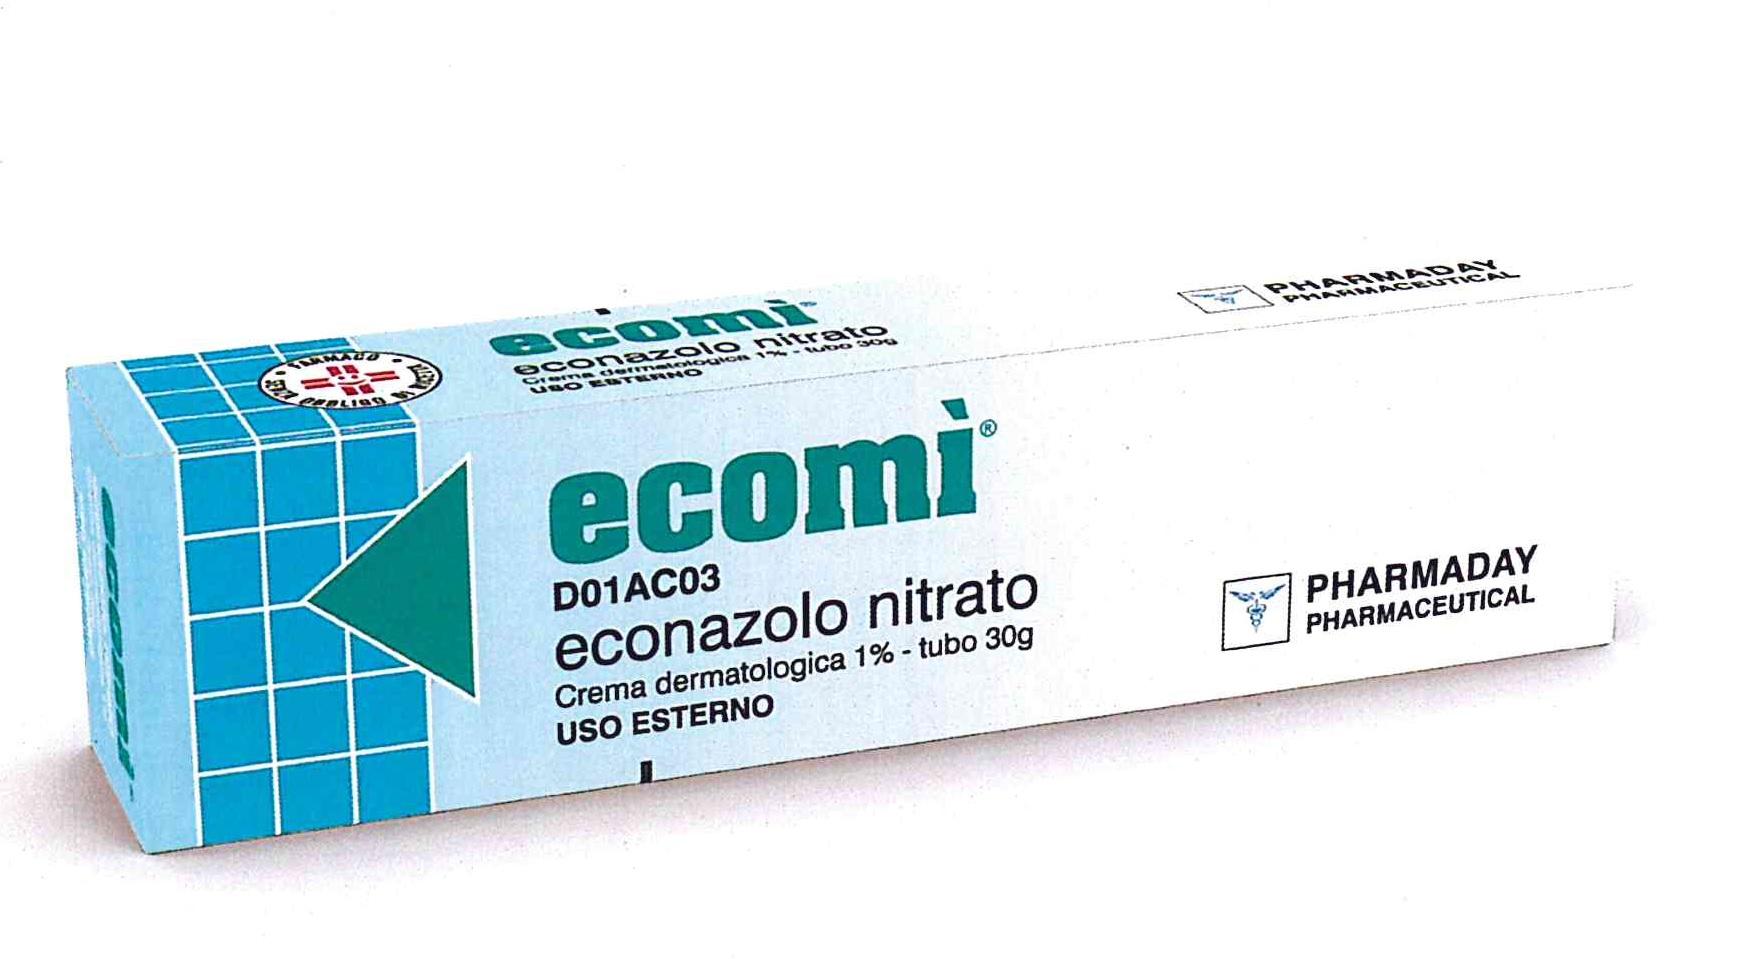 ECOMI*CREMA DERM 30G 1% - Farmajoy